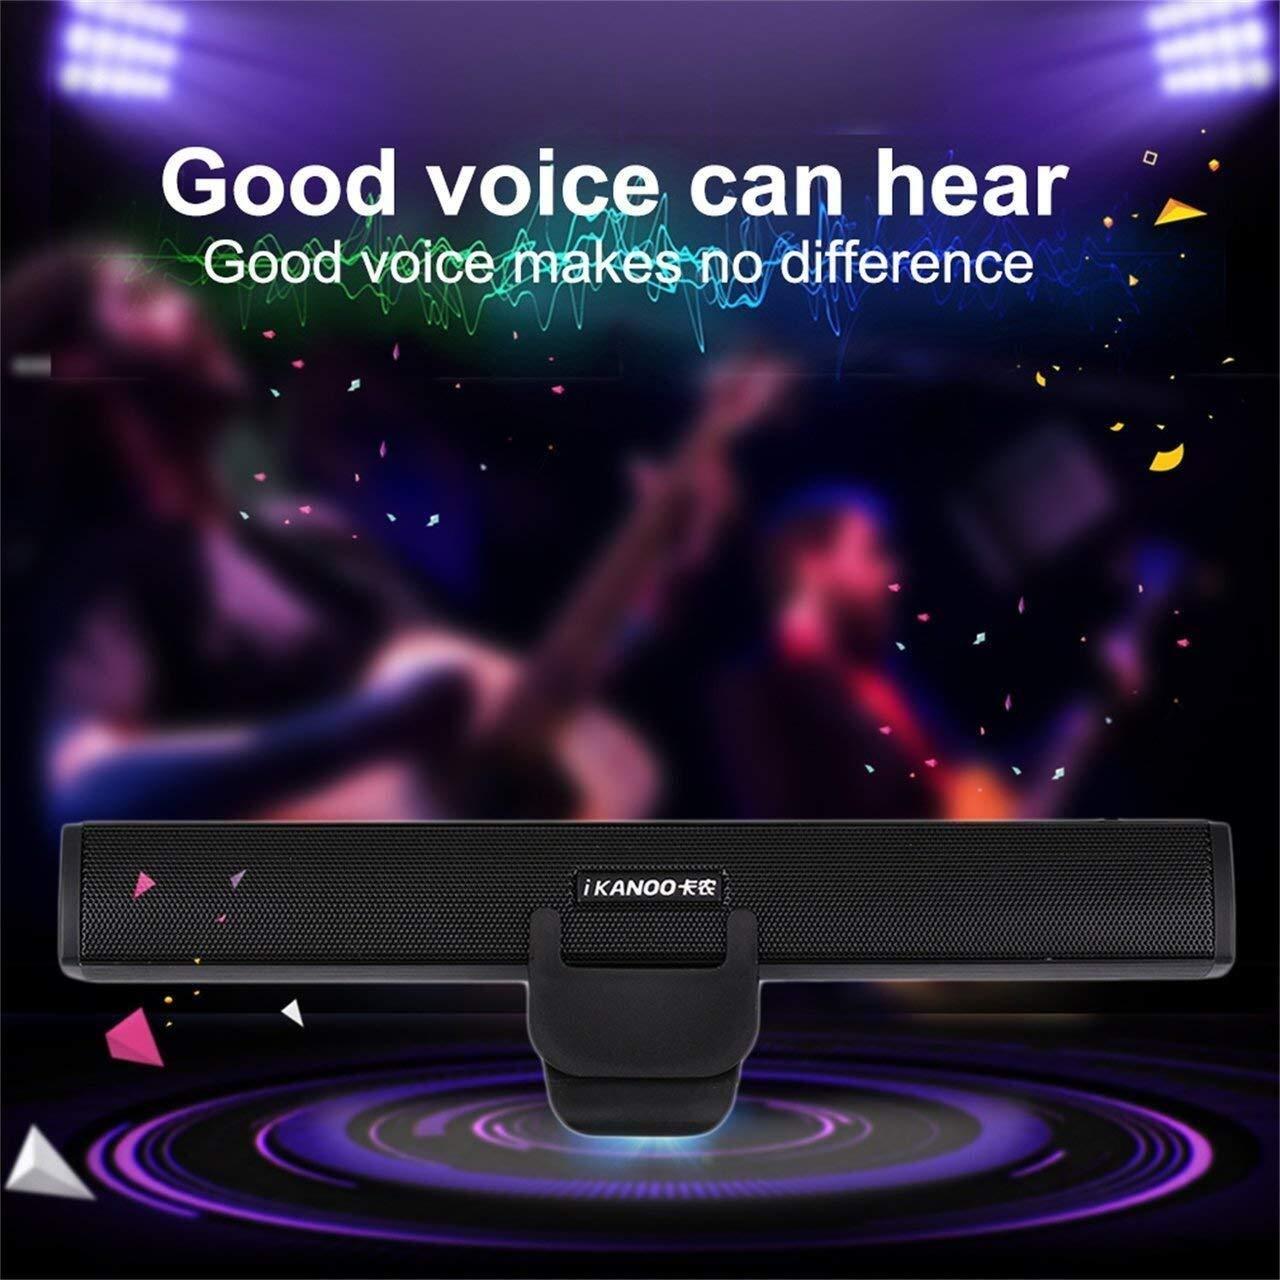 Ljlpropyh PC-Lautsprecher Ikanoo N12 Tragbarer USB-Laptop Tragbarer Stereolautsprecher Audio Soundbar Mini-USB-Laptoplautsprecher for PC-Laptop-Computer